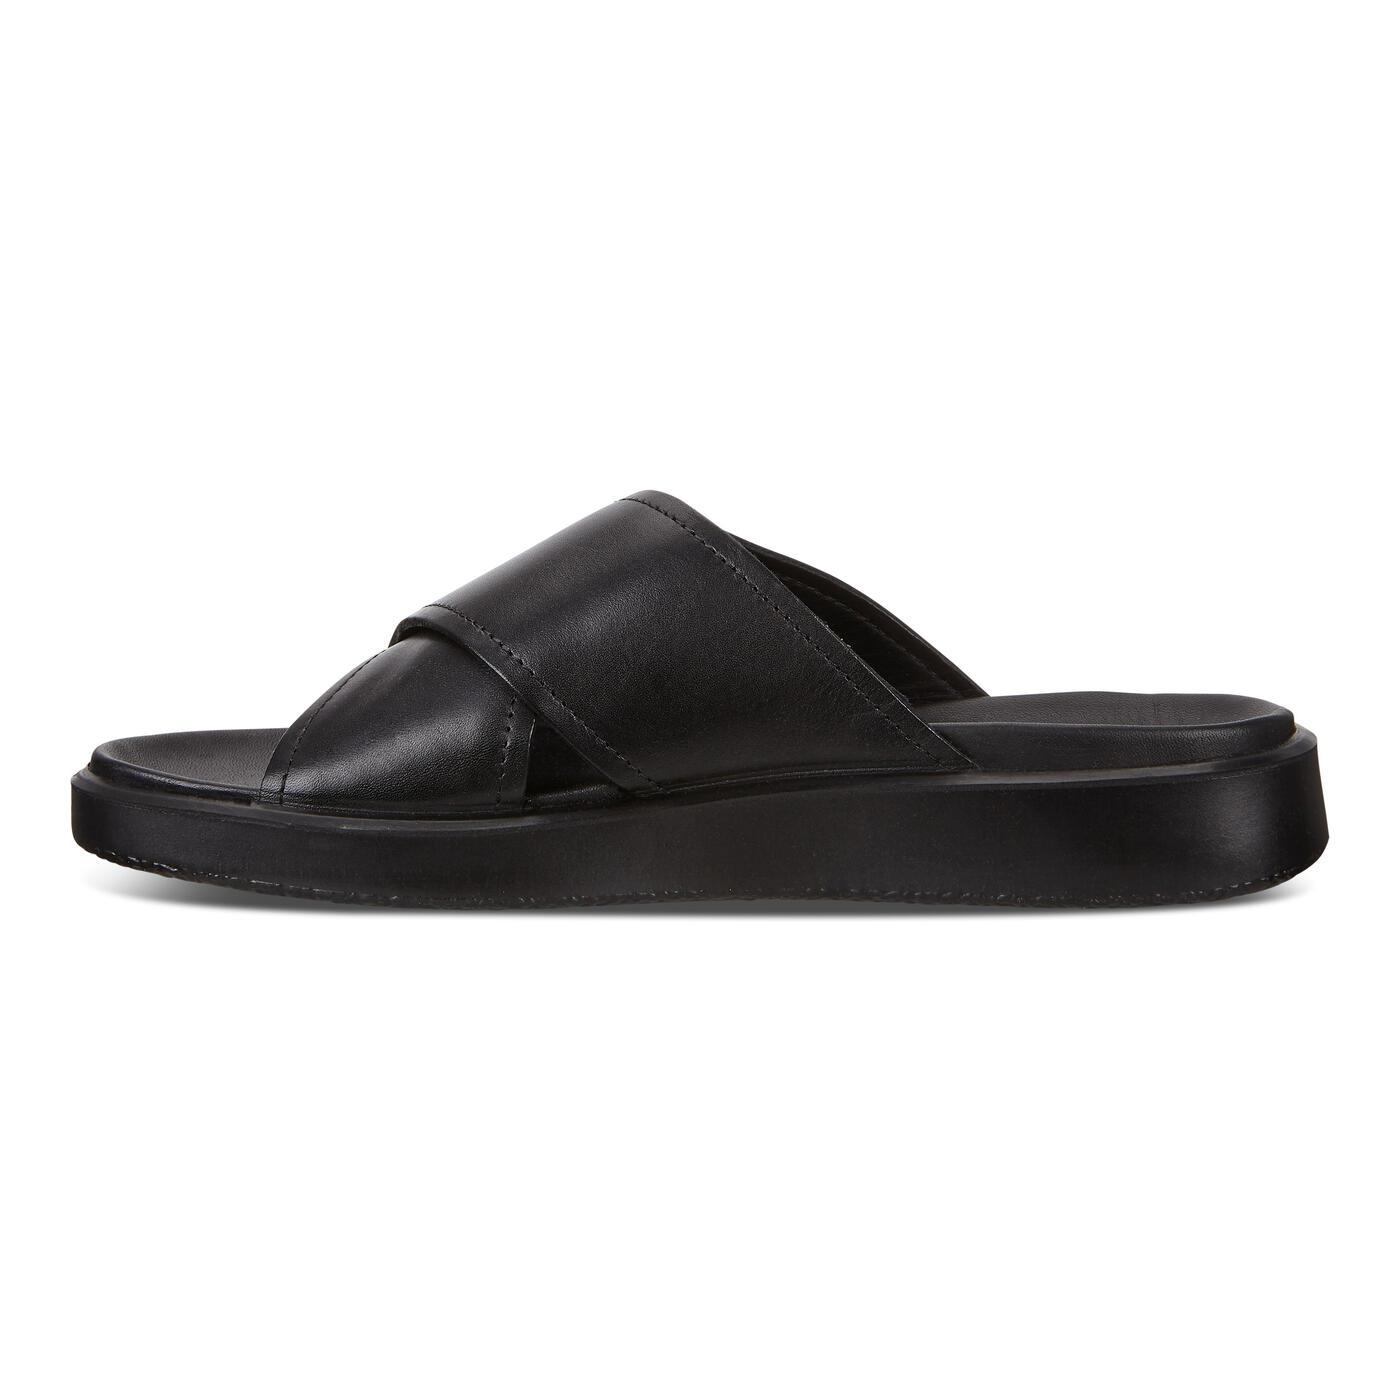 ECCO Flowt LX Men's Slides